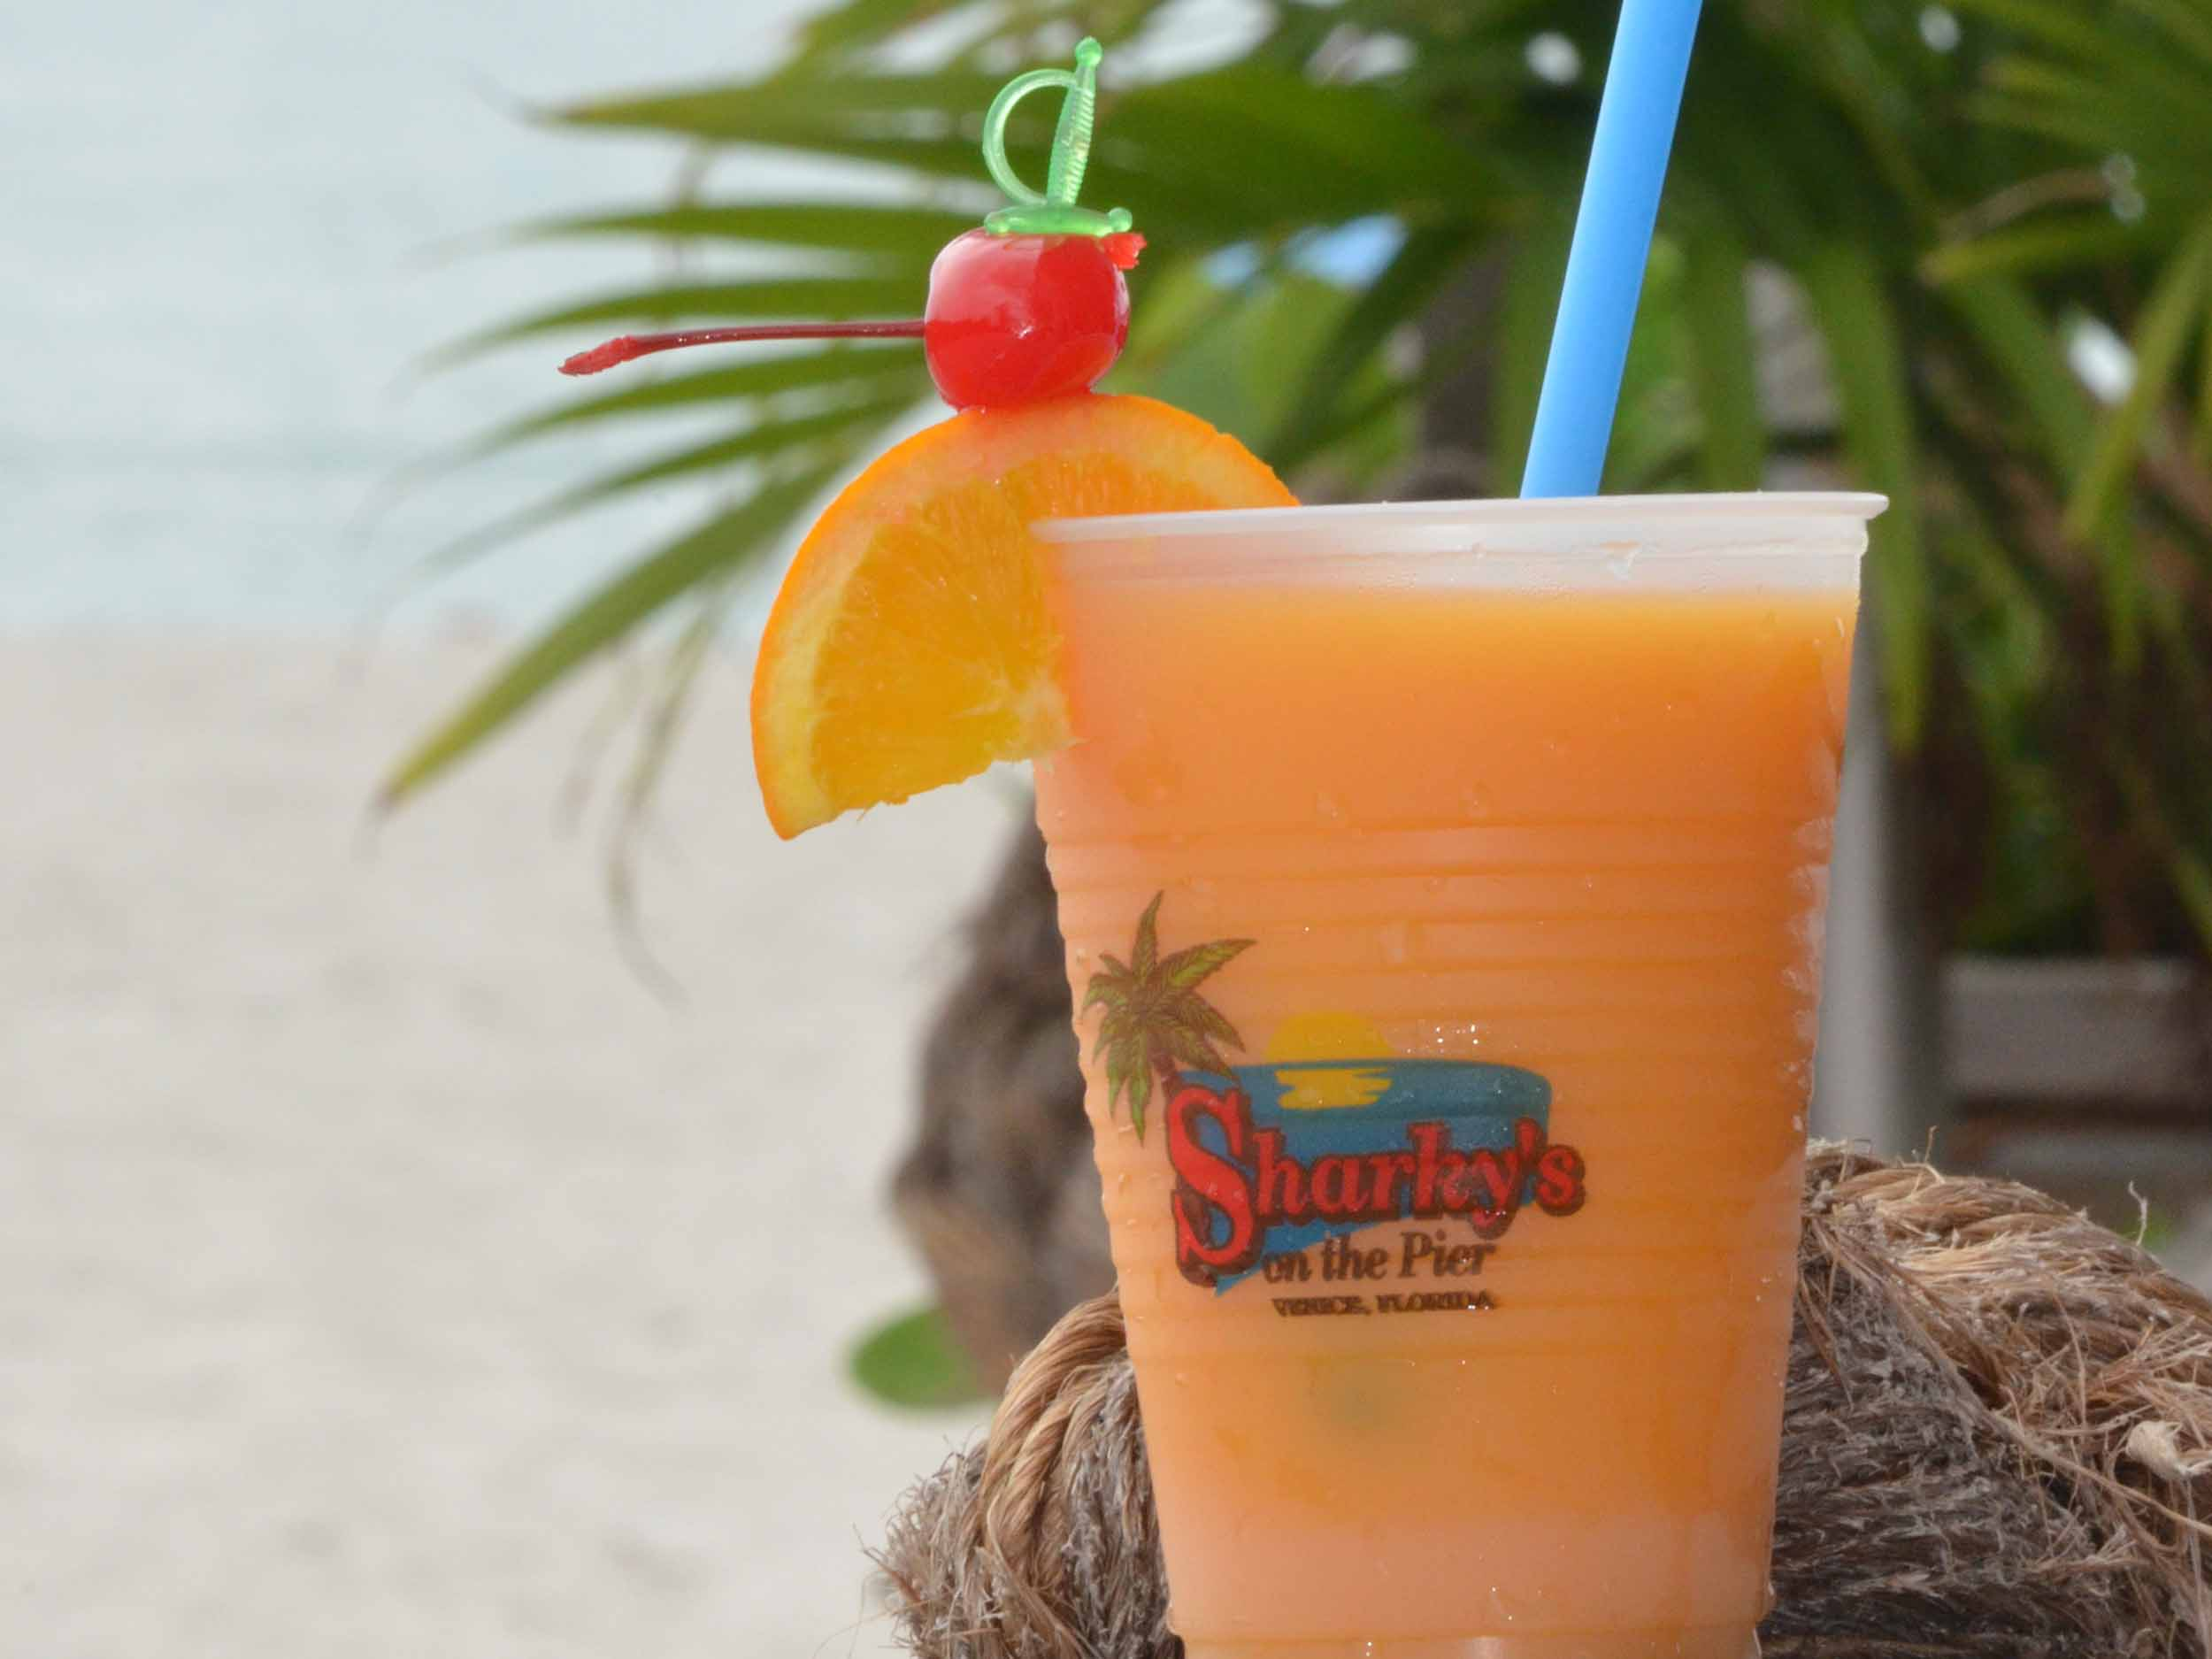 Sharky's on the Pier Mango Bango Drink